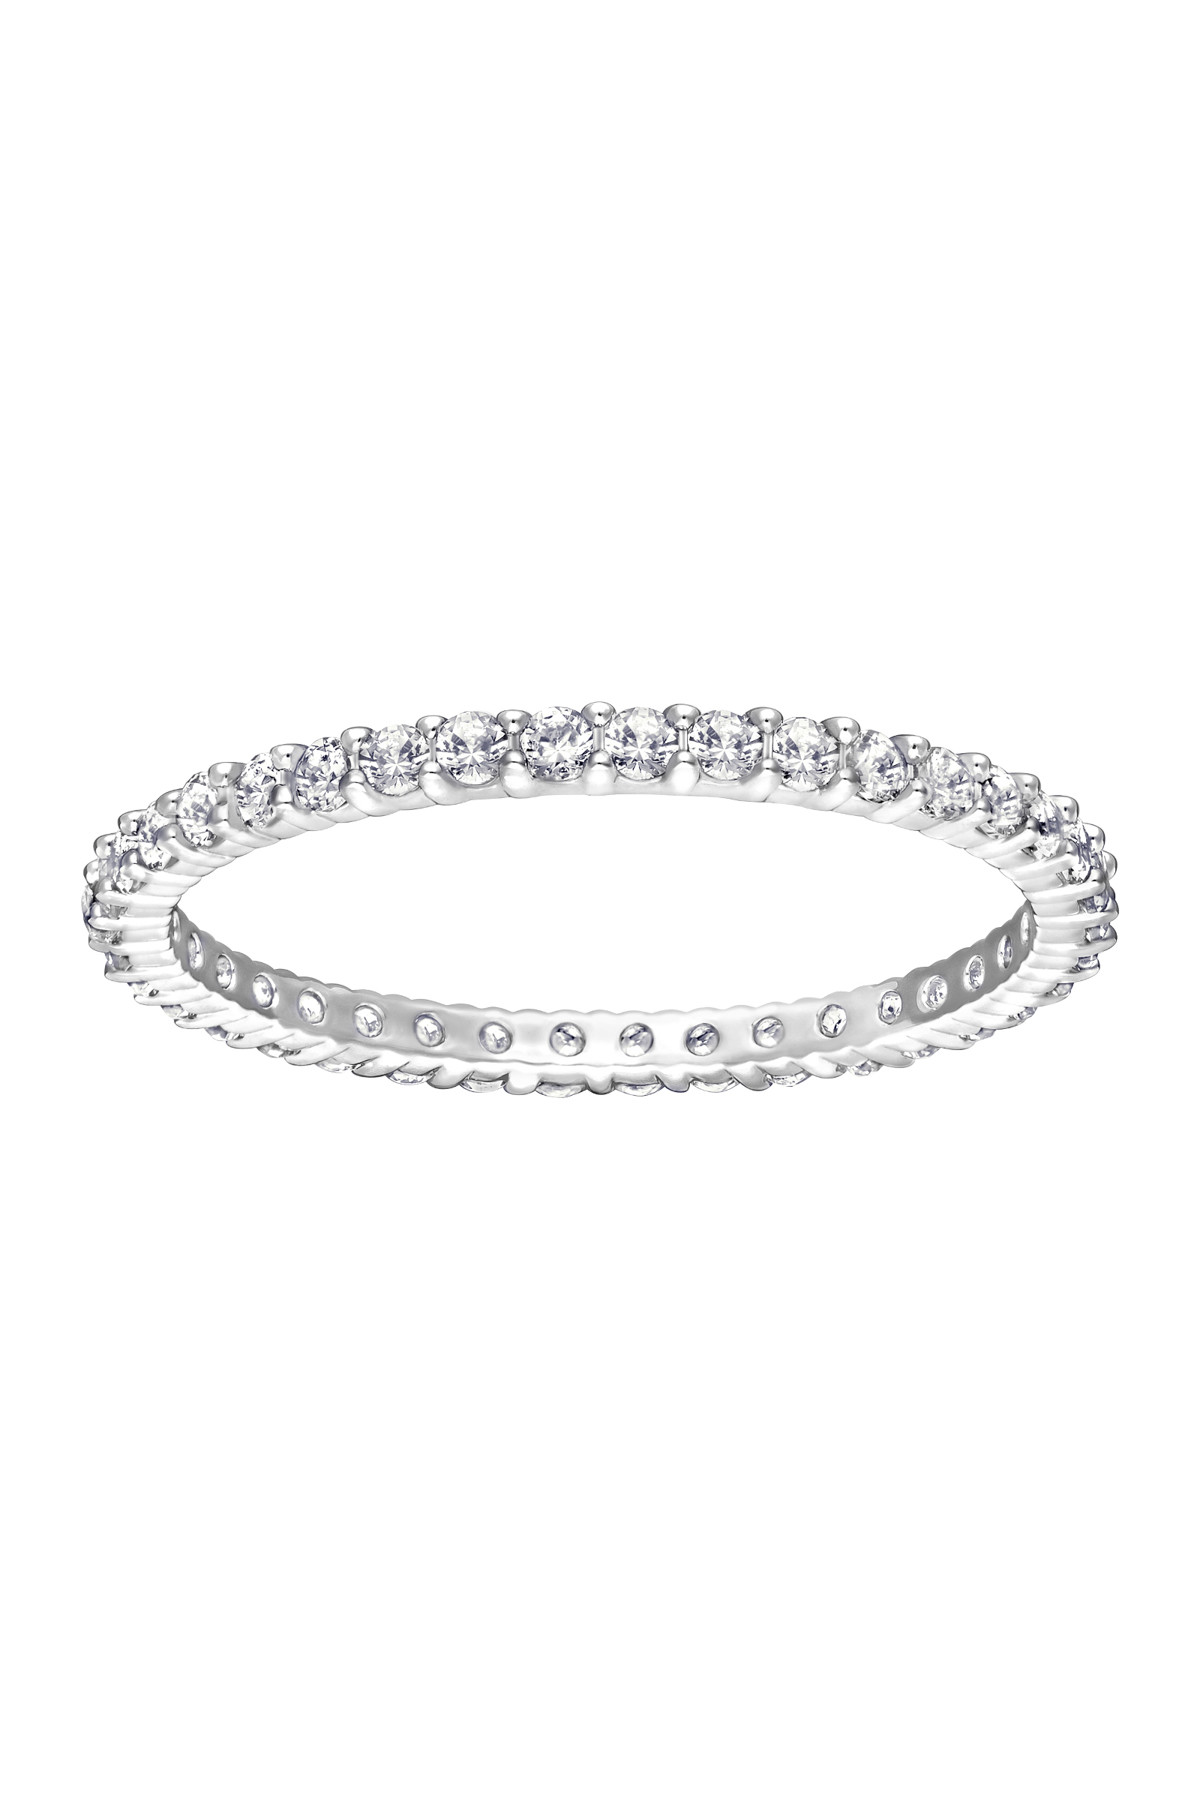 Swarovski Kadın Yüzük Vıttore Ring 55 5007779 1